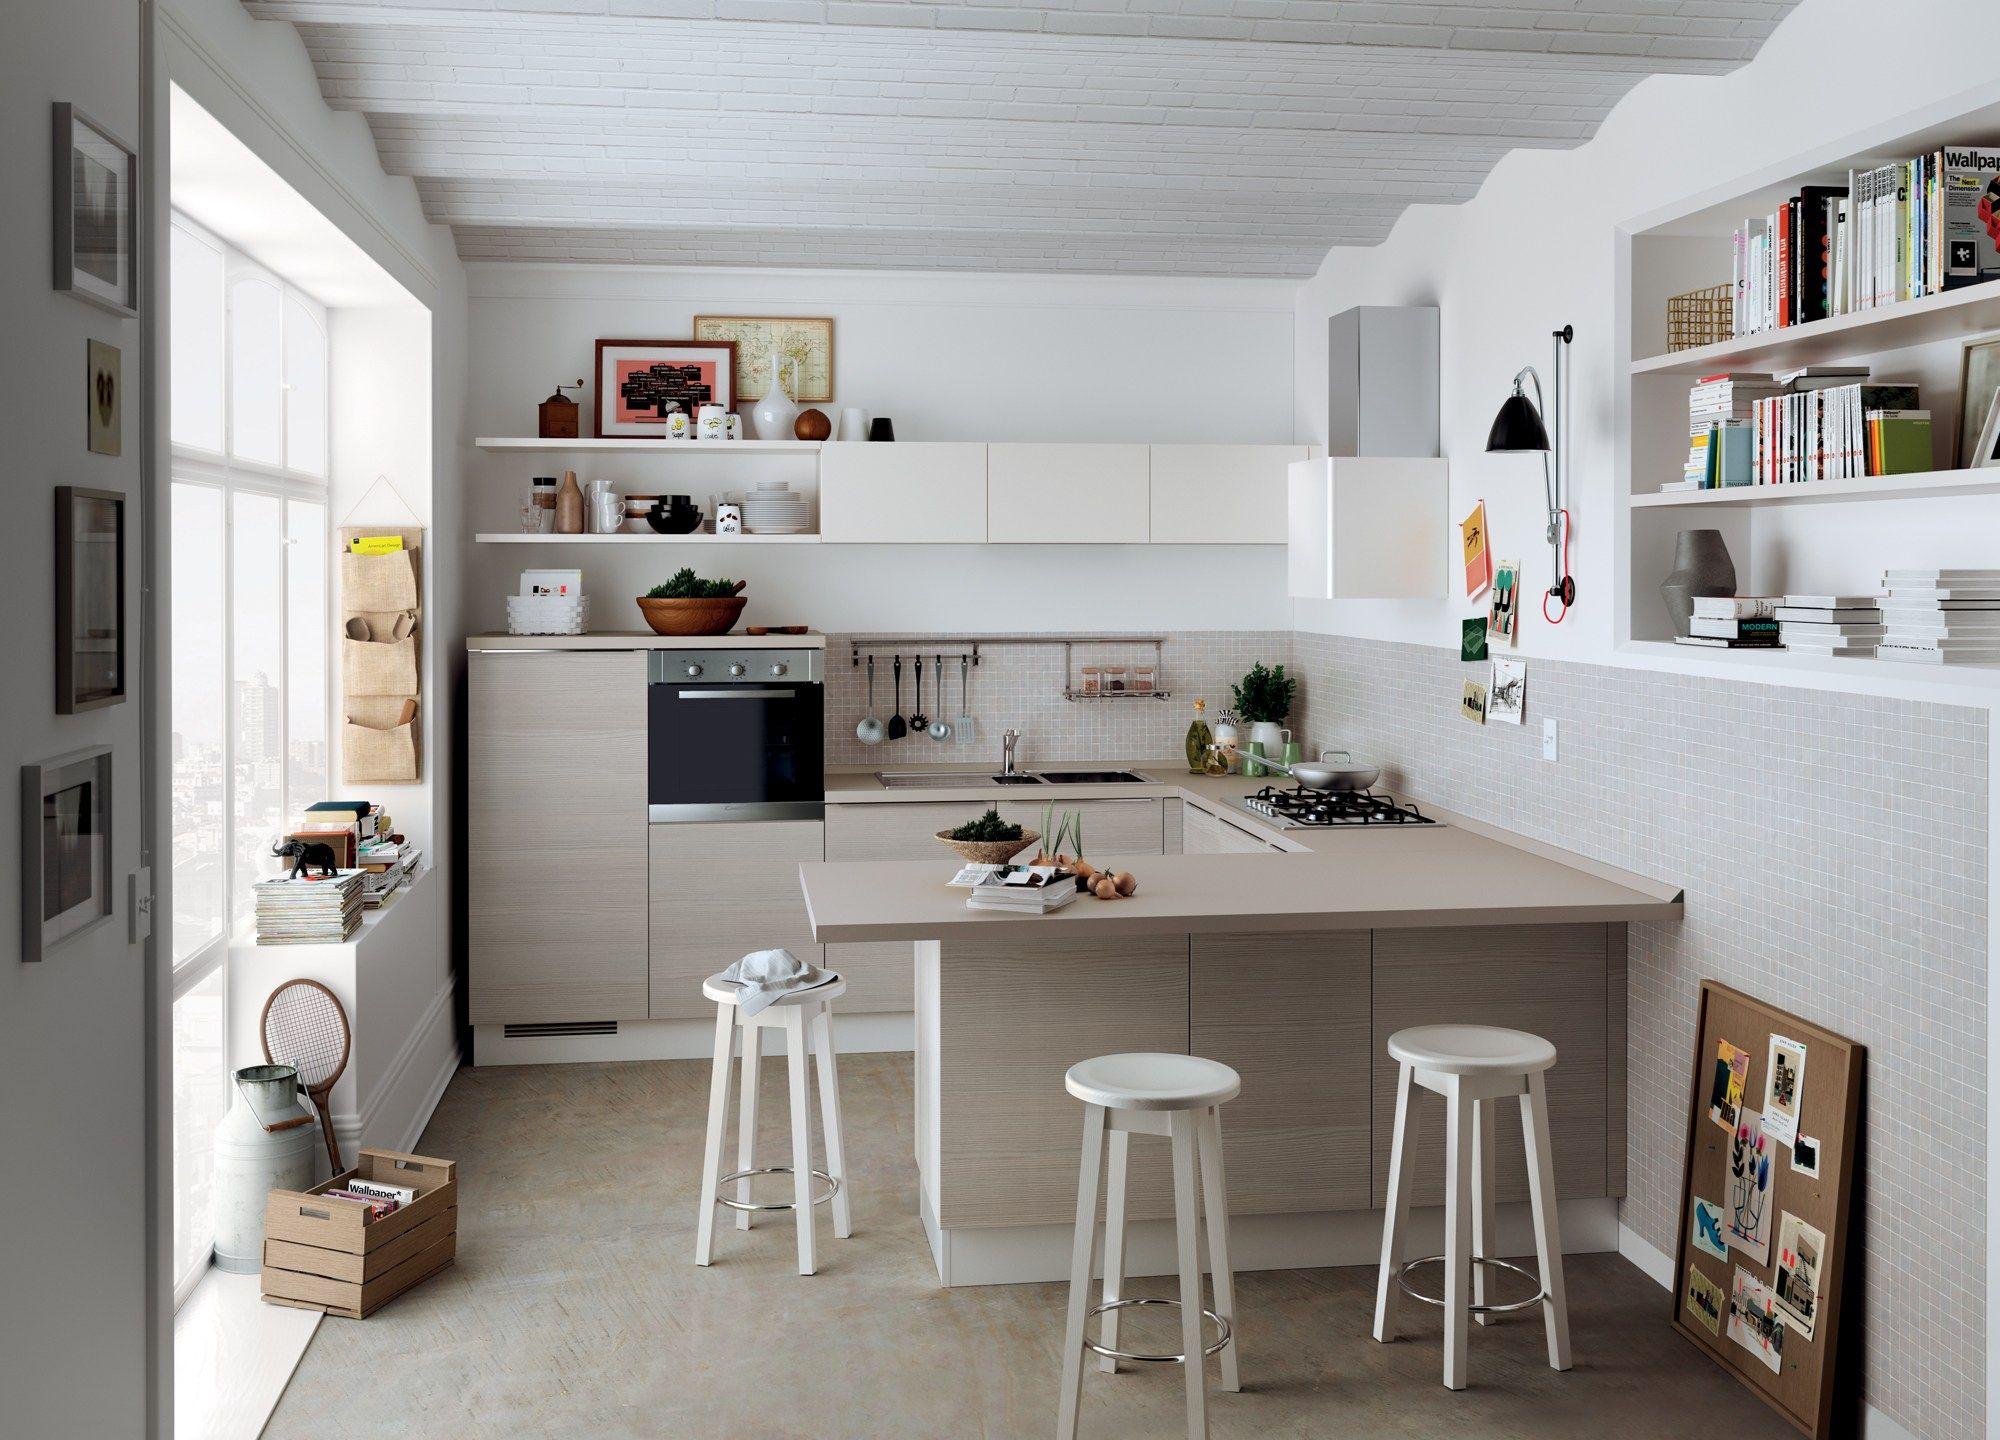 Галерея кухонь компании scavolini, италия.